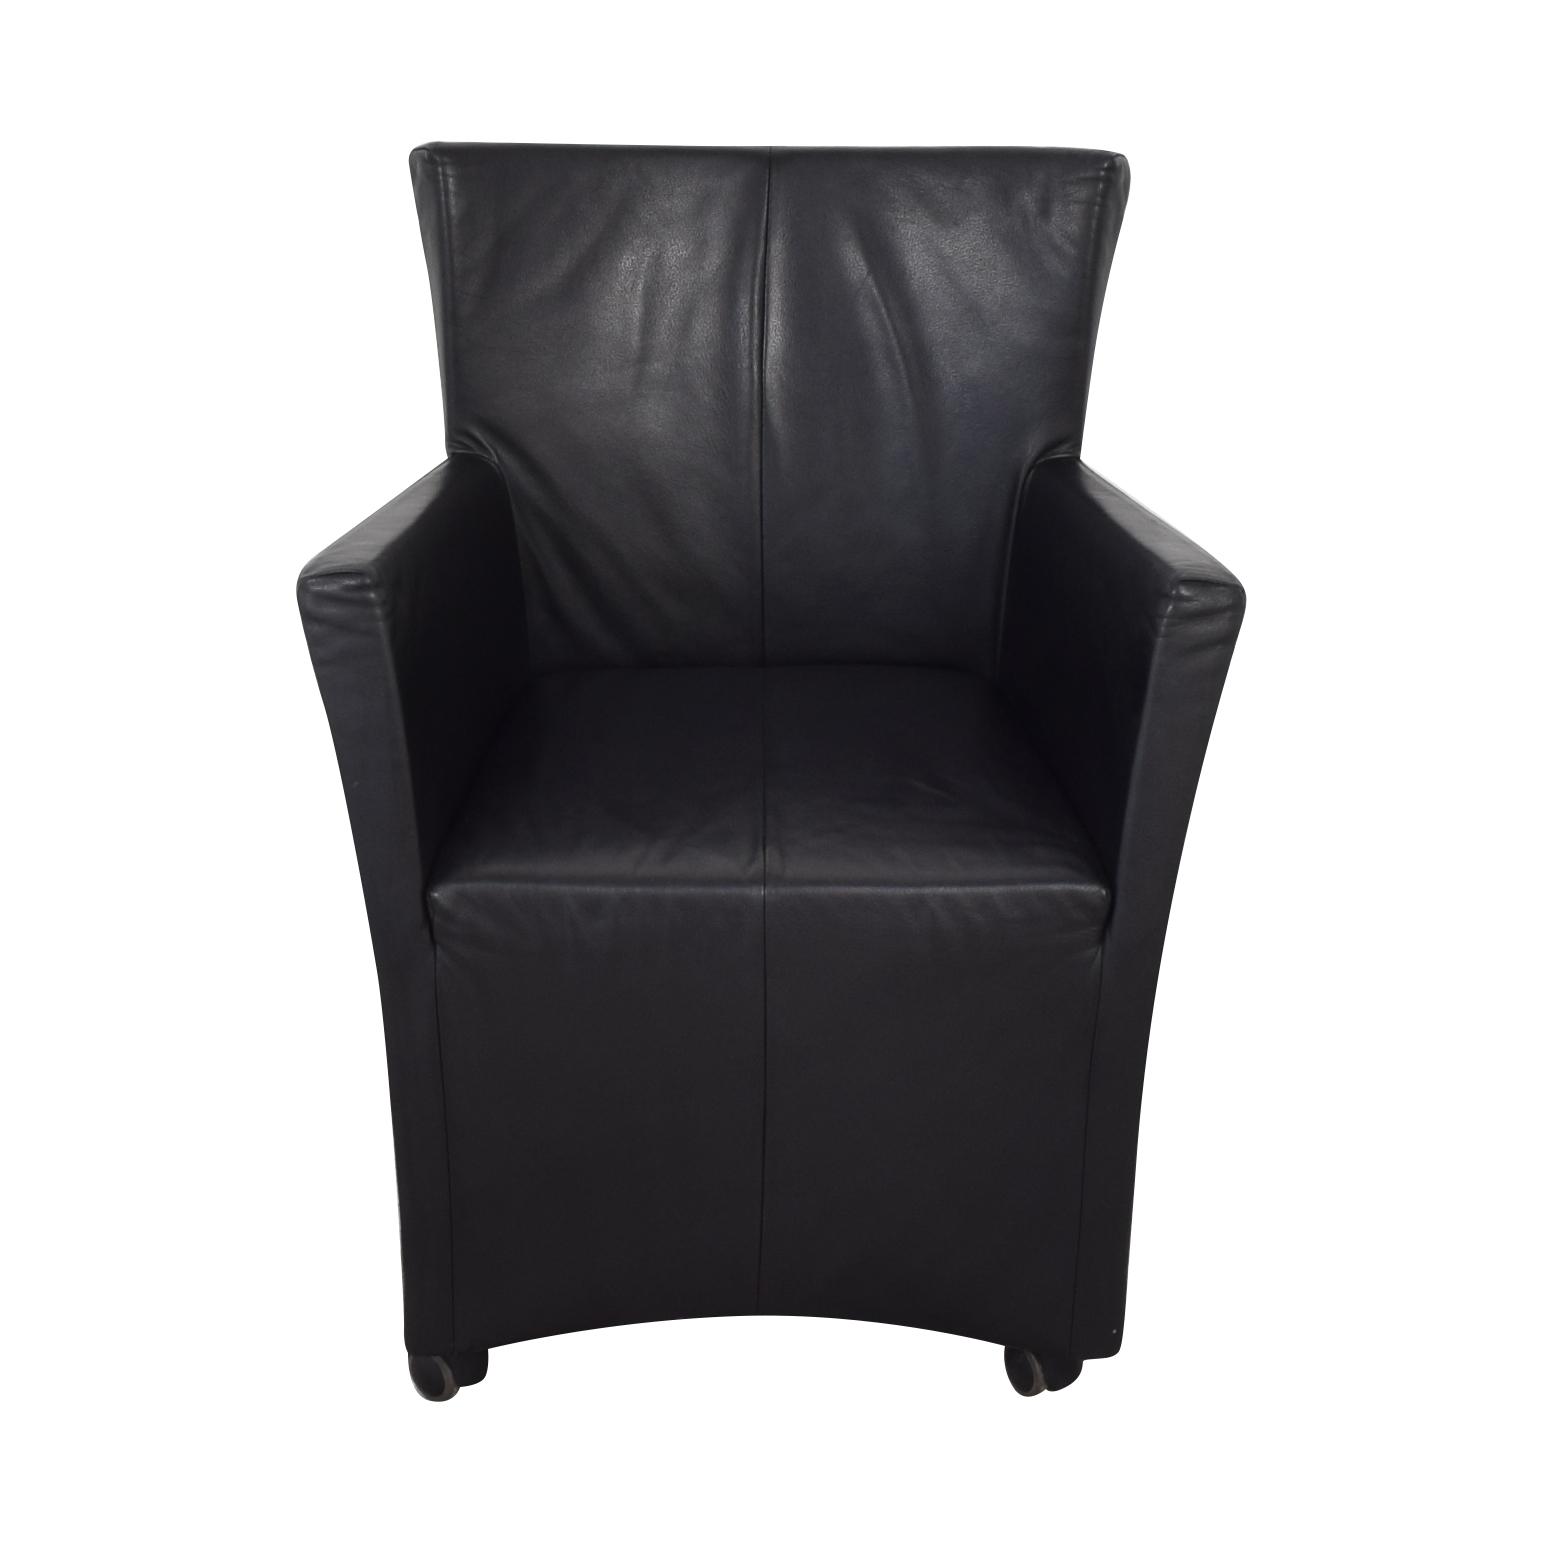 Montis Montis Sting Arm Chair nj